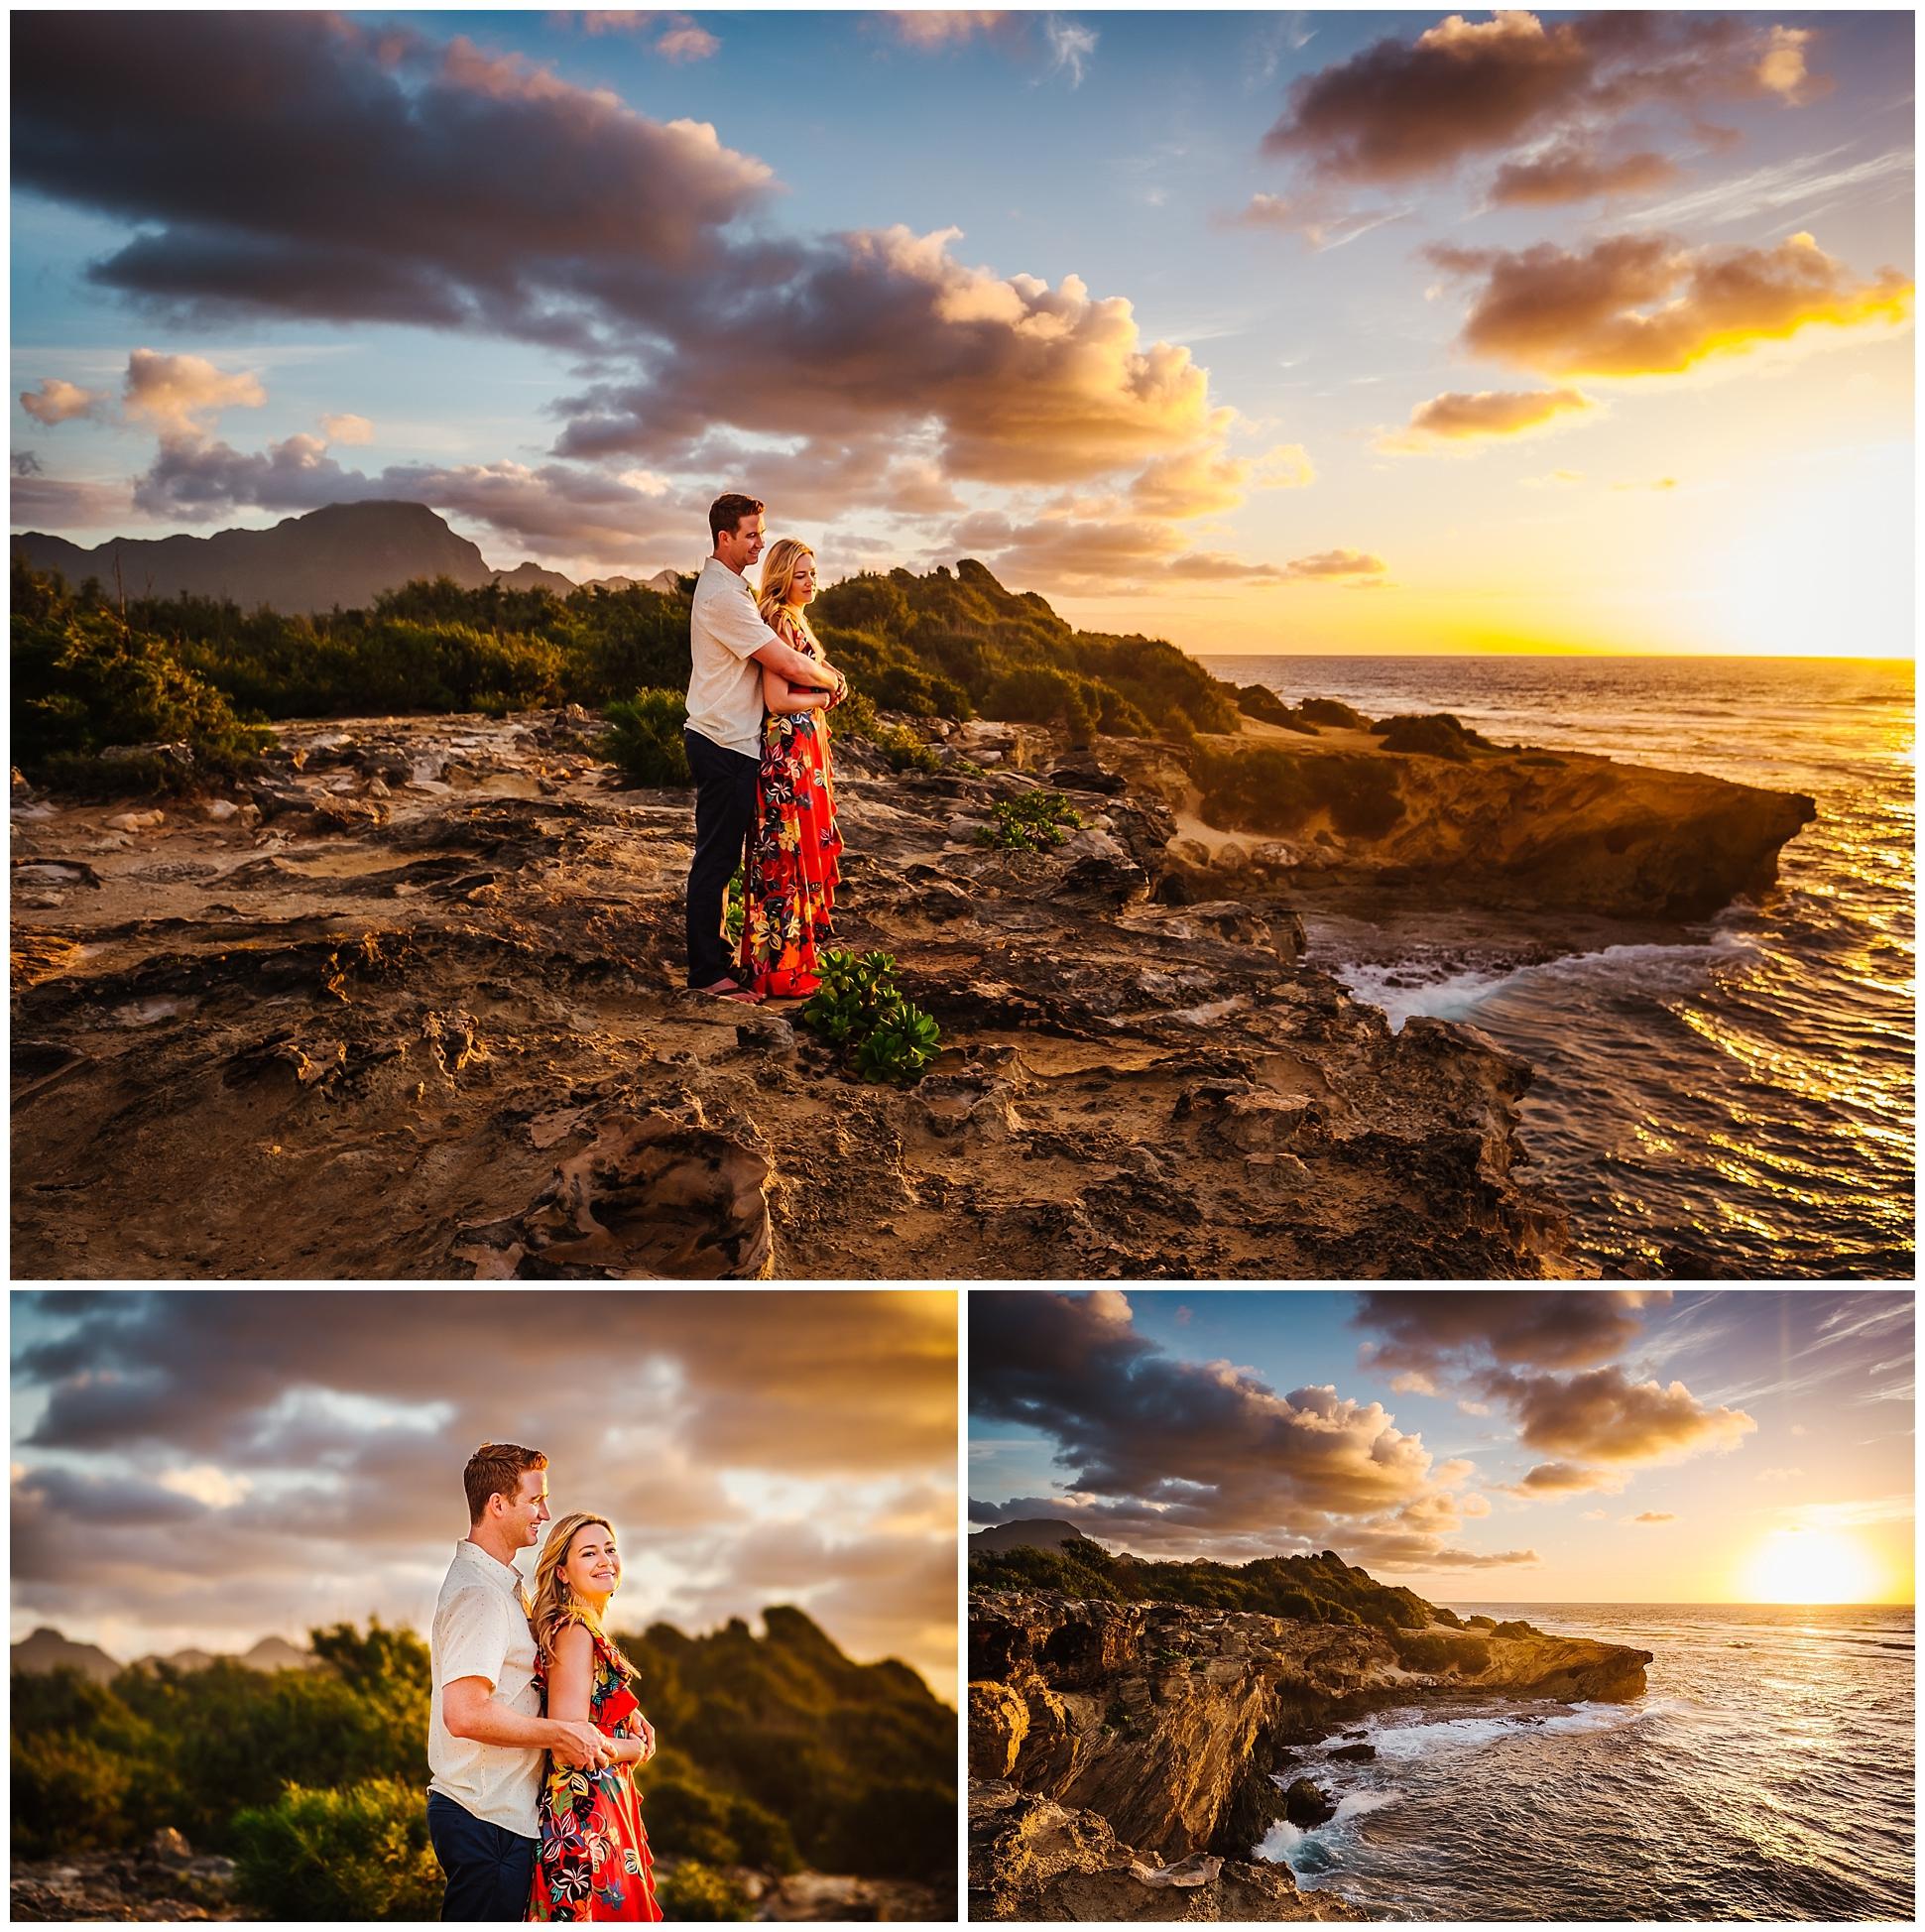 hawaiin-honeymoon-sunrise-portraits-kauai-grand-hystt-destination-photographer_0005.jpg